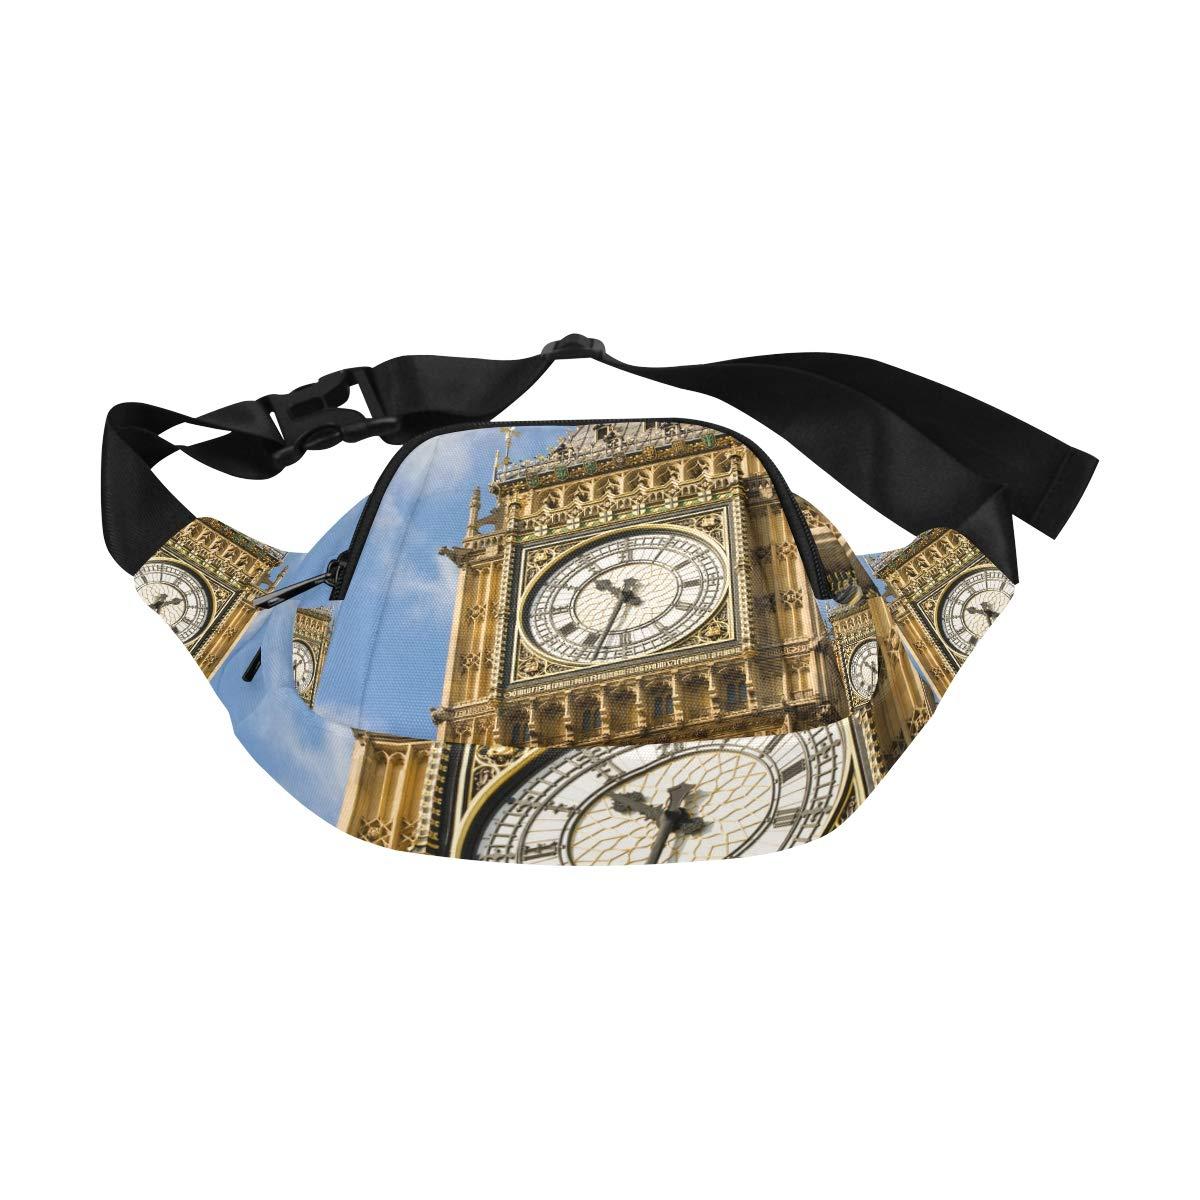 Closeup Of The Clock Face Of Big Ben Fenny Packs Waist Bags Adjustable Belt Waterproof Nylon Travel Running Sport Vacation Party For Men Women Boys Girls Kids